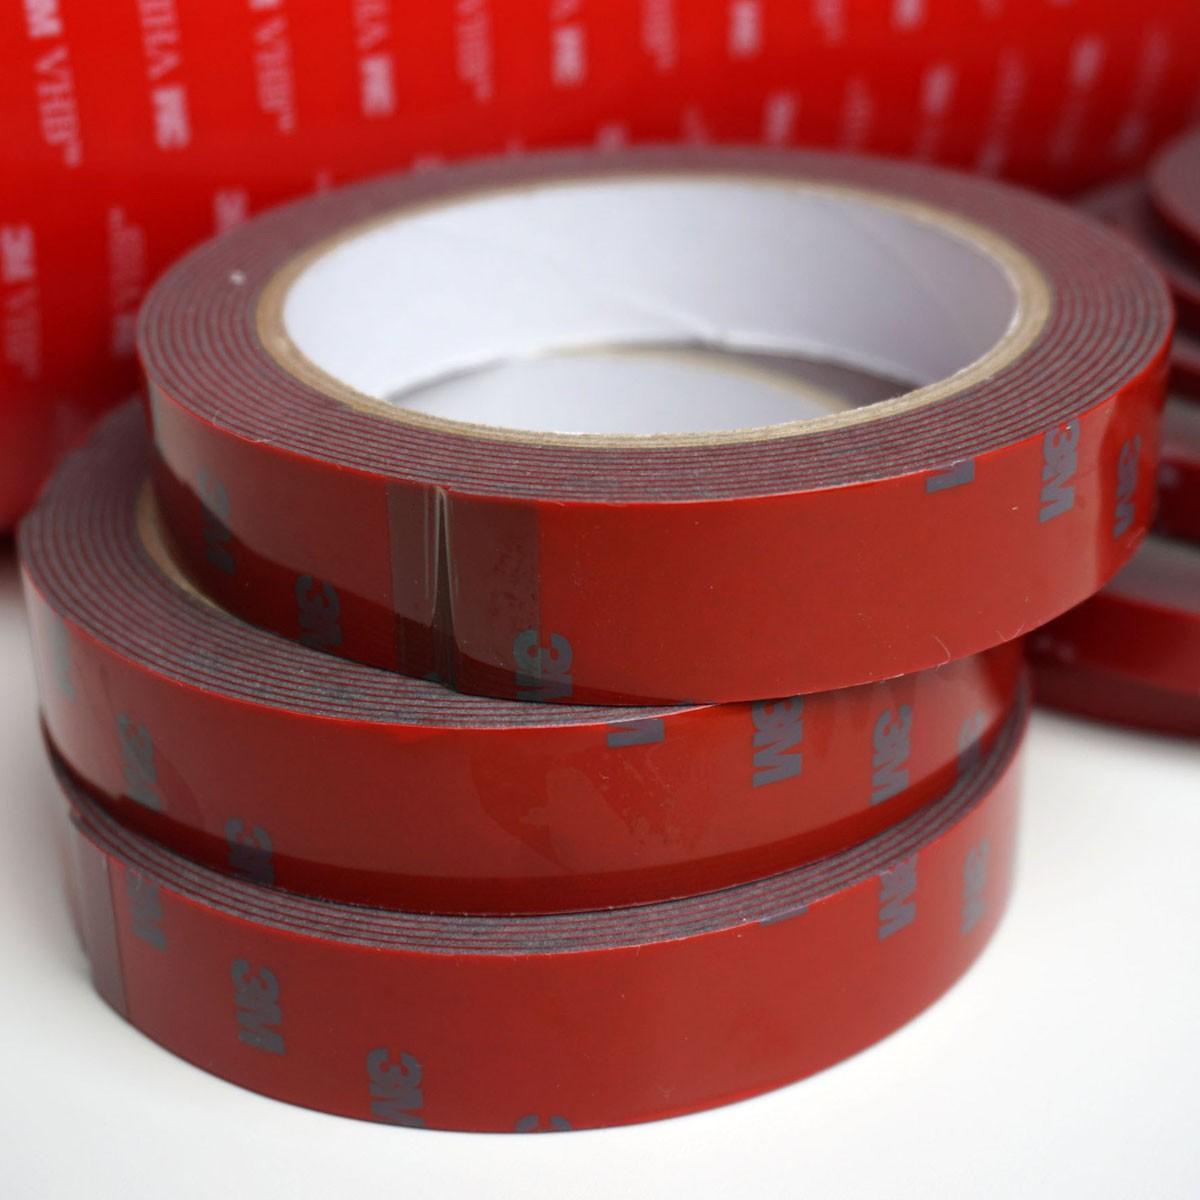 VHB Doppelseitiges Klebeband Montageklebeband Hochleistungsklebeband